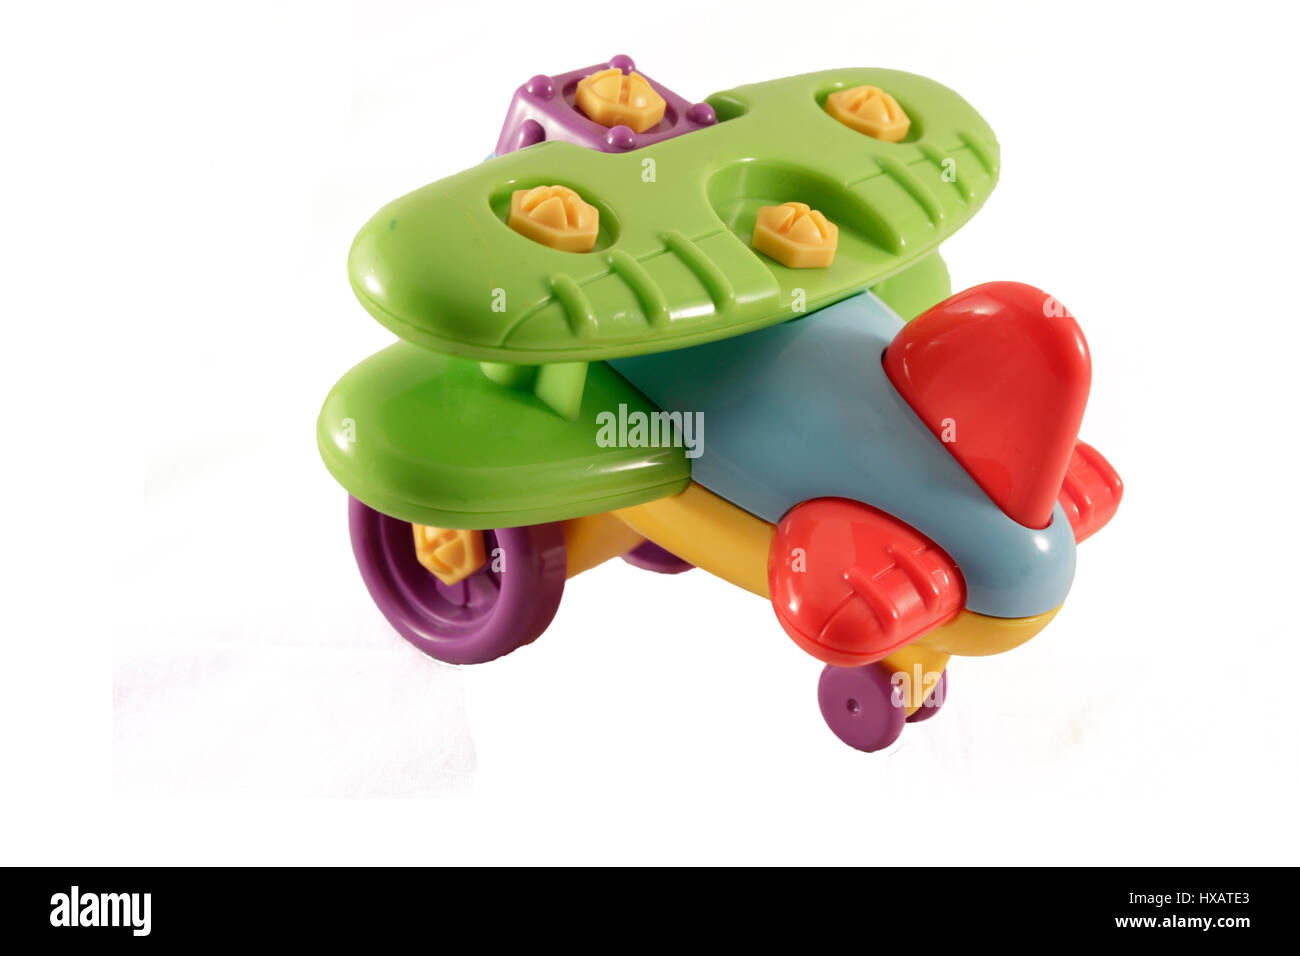 Kinder Spielzeug Flugzeug designer Stockbild